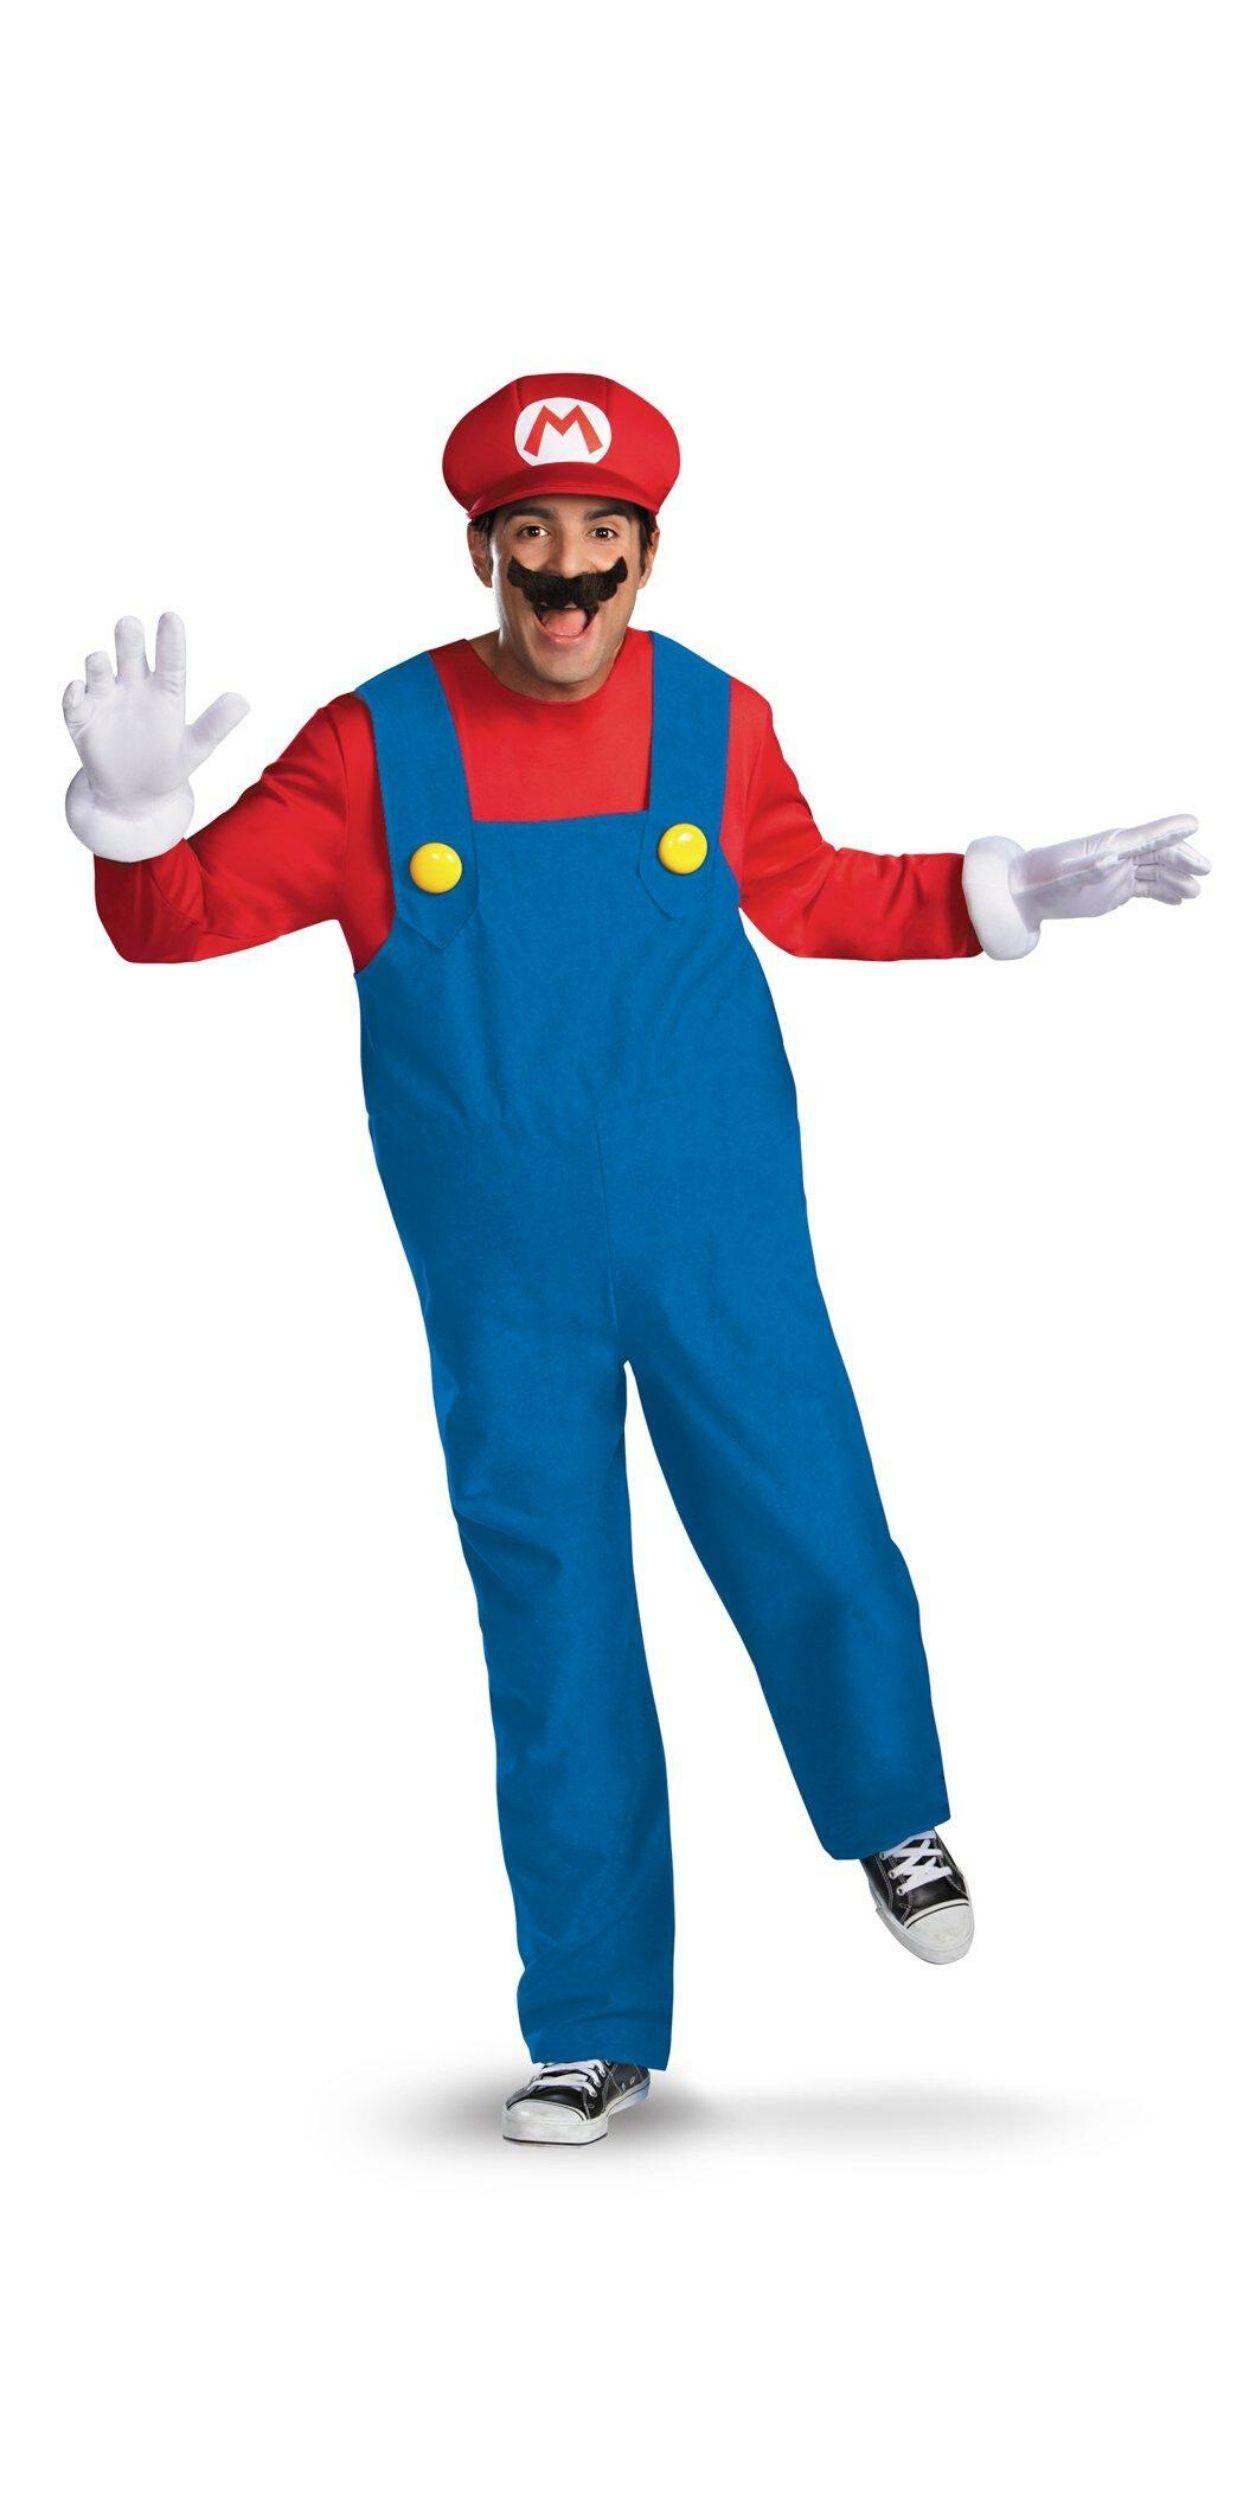 Man in Mario Party Costume